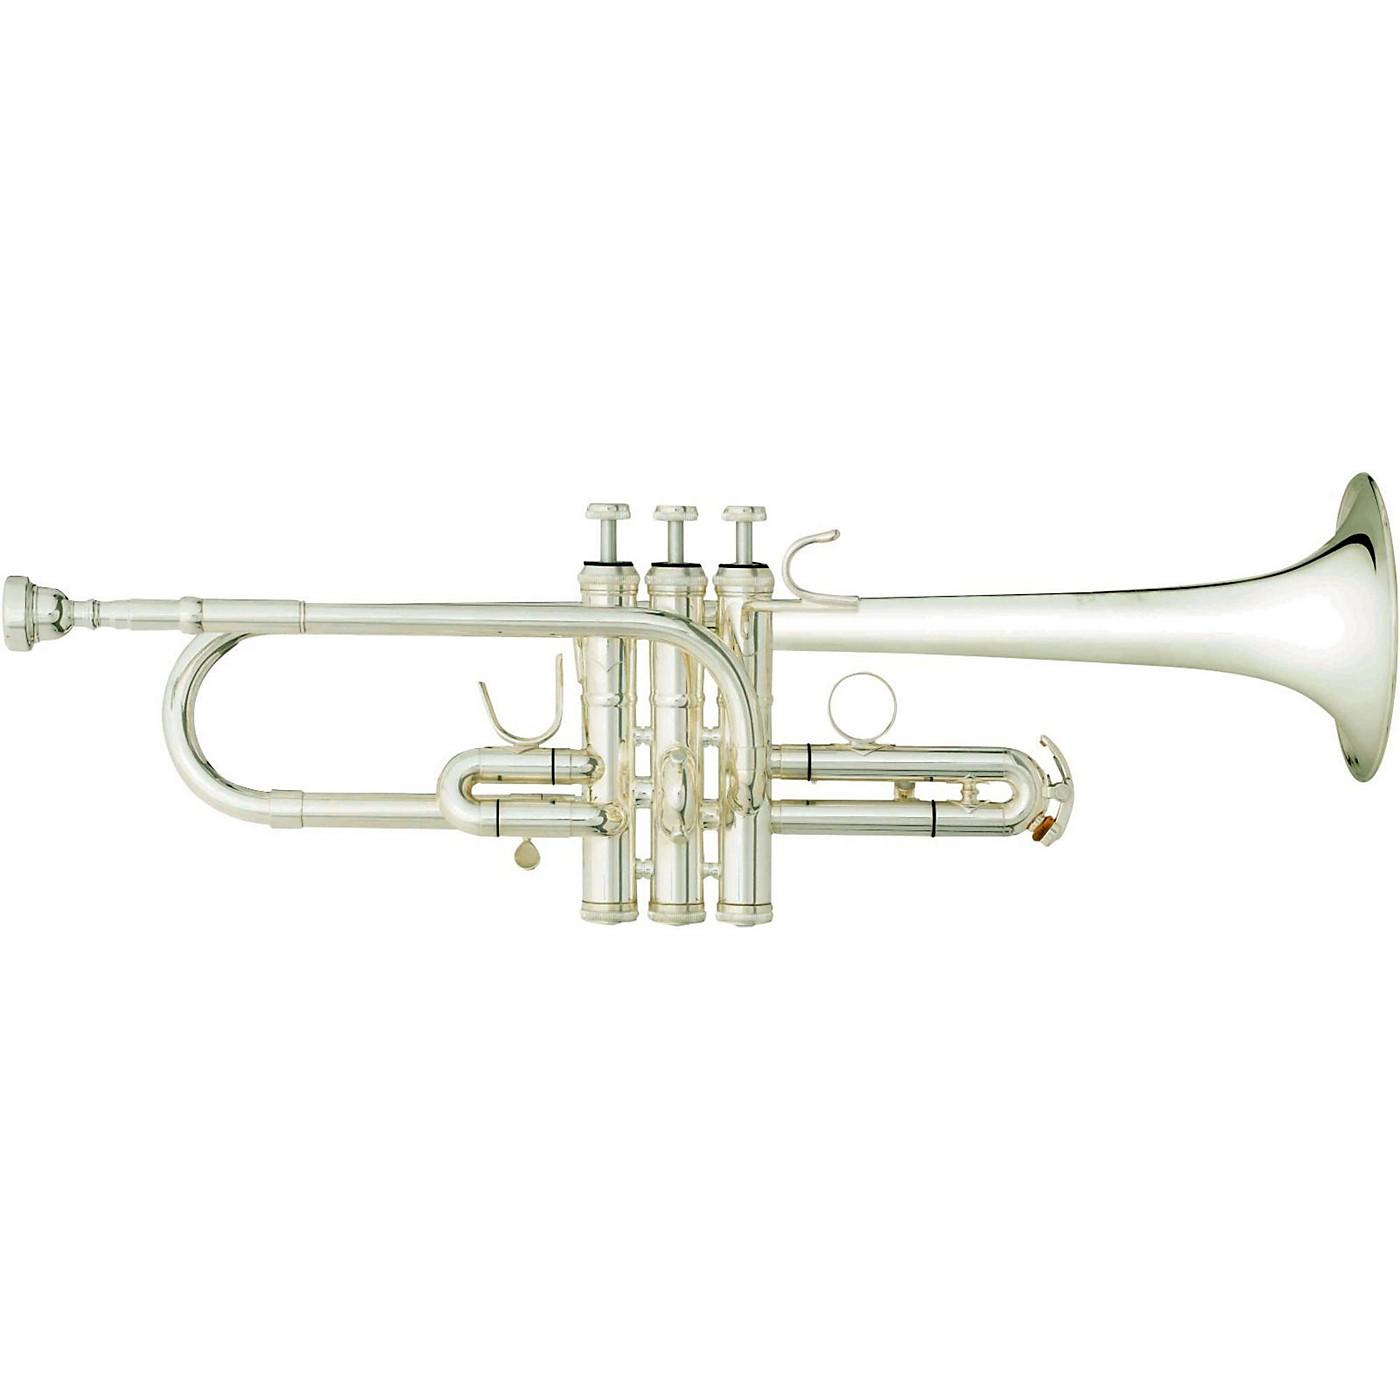 B&S 3116 Challenger II Series Eb/D Trumpet thumbnail